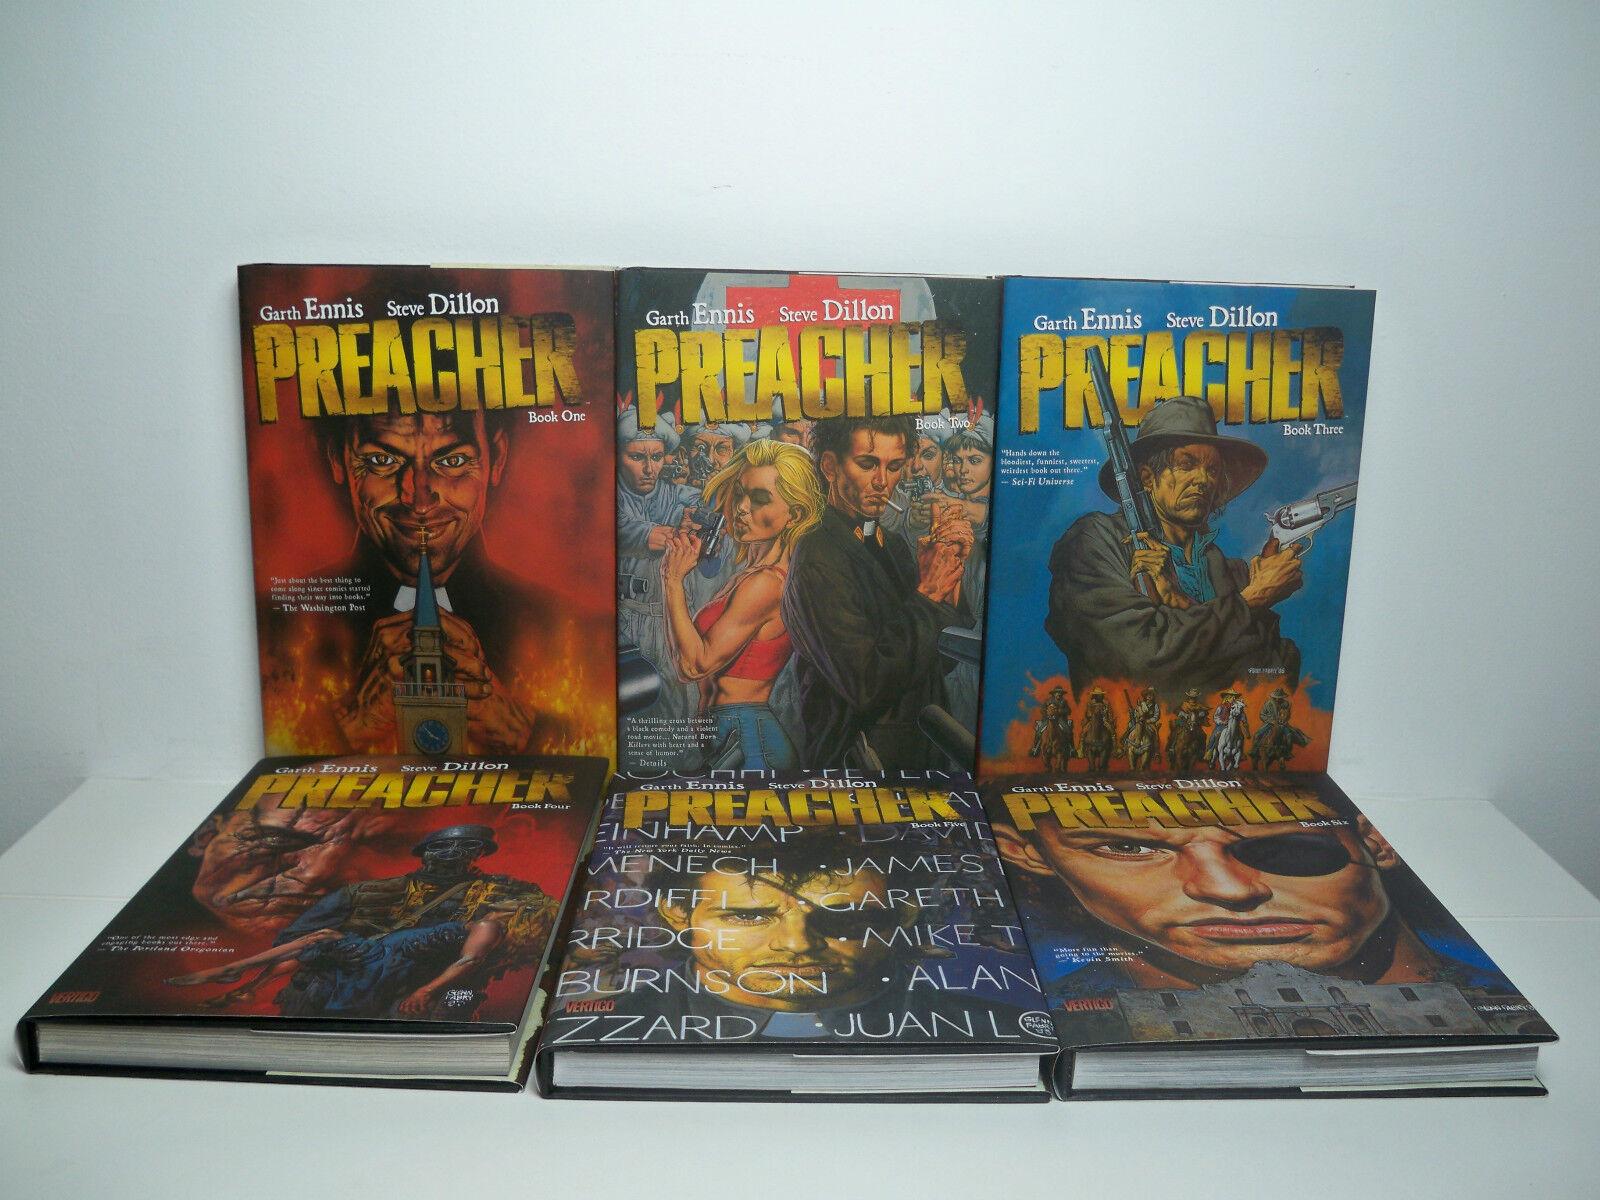 R0500053 PREACHER HARD COVER COMPLETE SET VOLUMES 1,2,3,4,5,6 NEAR MINT